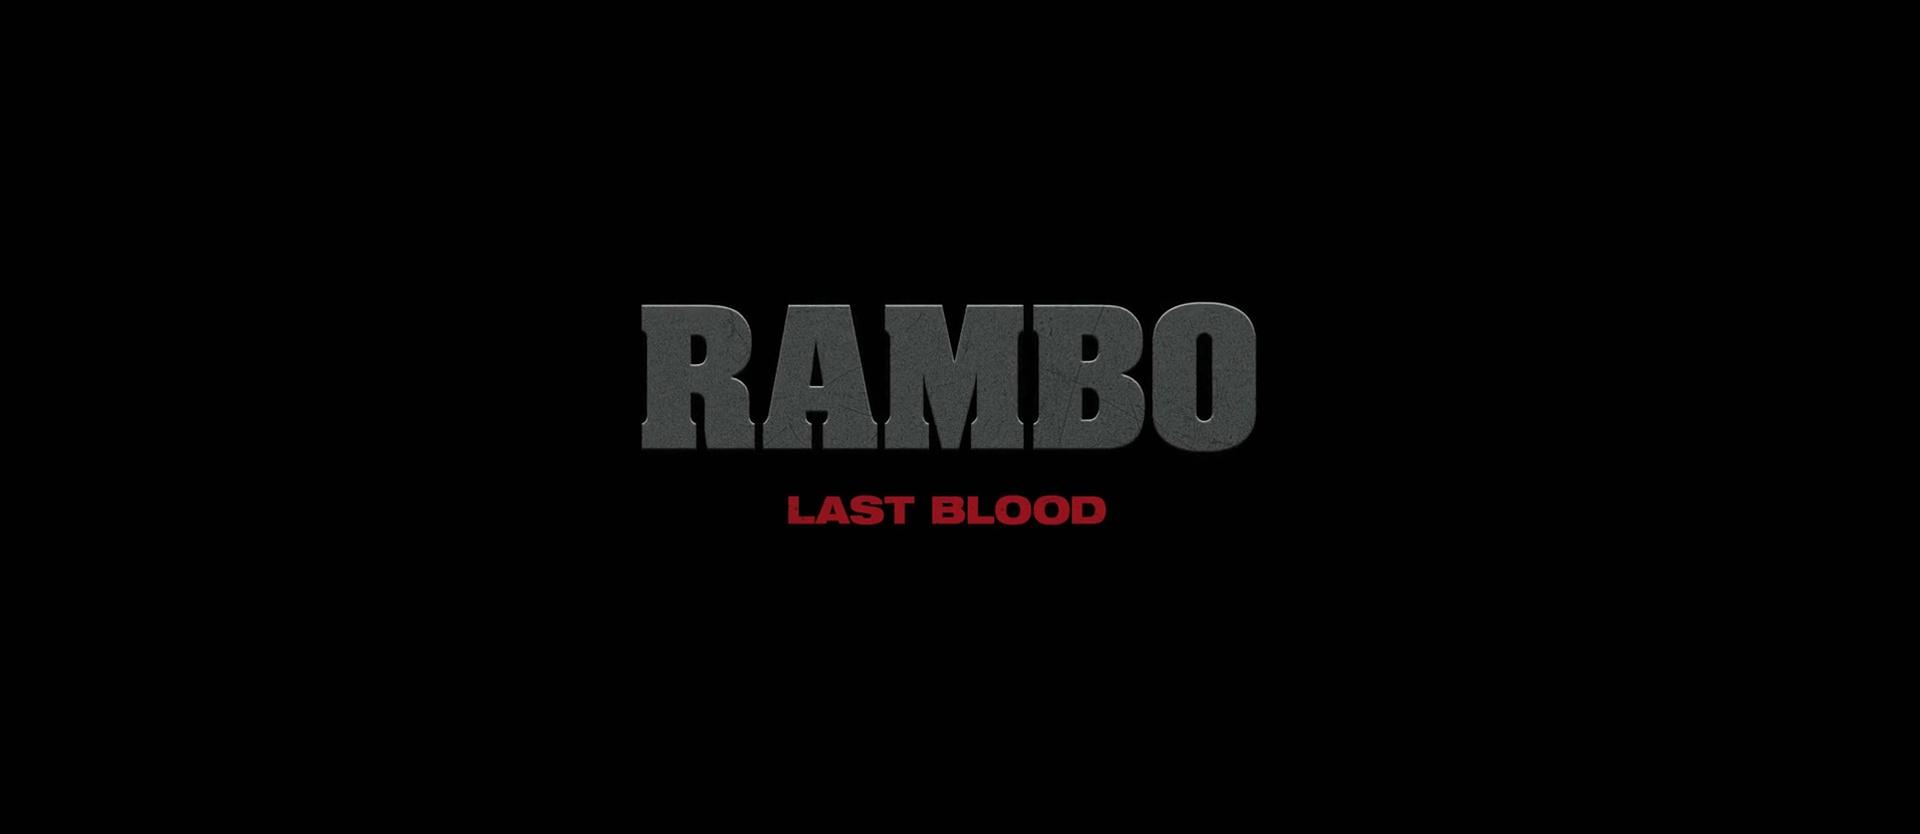 RAMBO LAST BLOOD de Adrian Gunberg (2019)